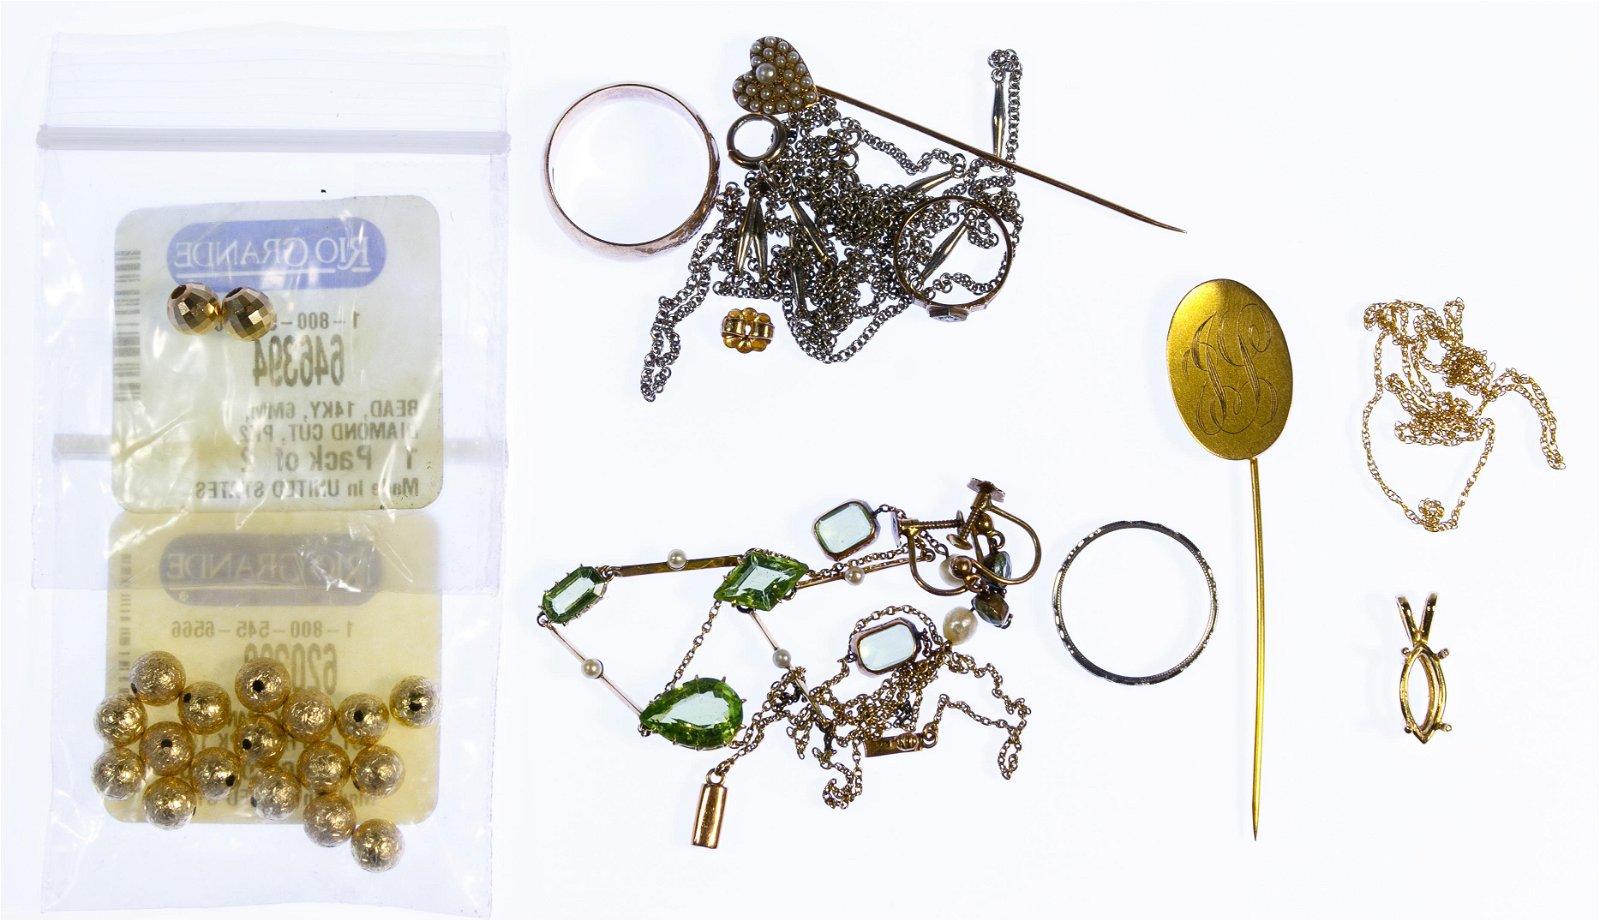 14k / 10k / 9k Gold Jewelry Assortment